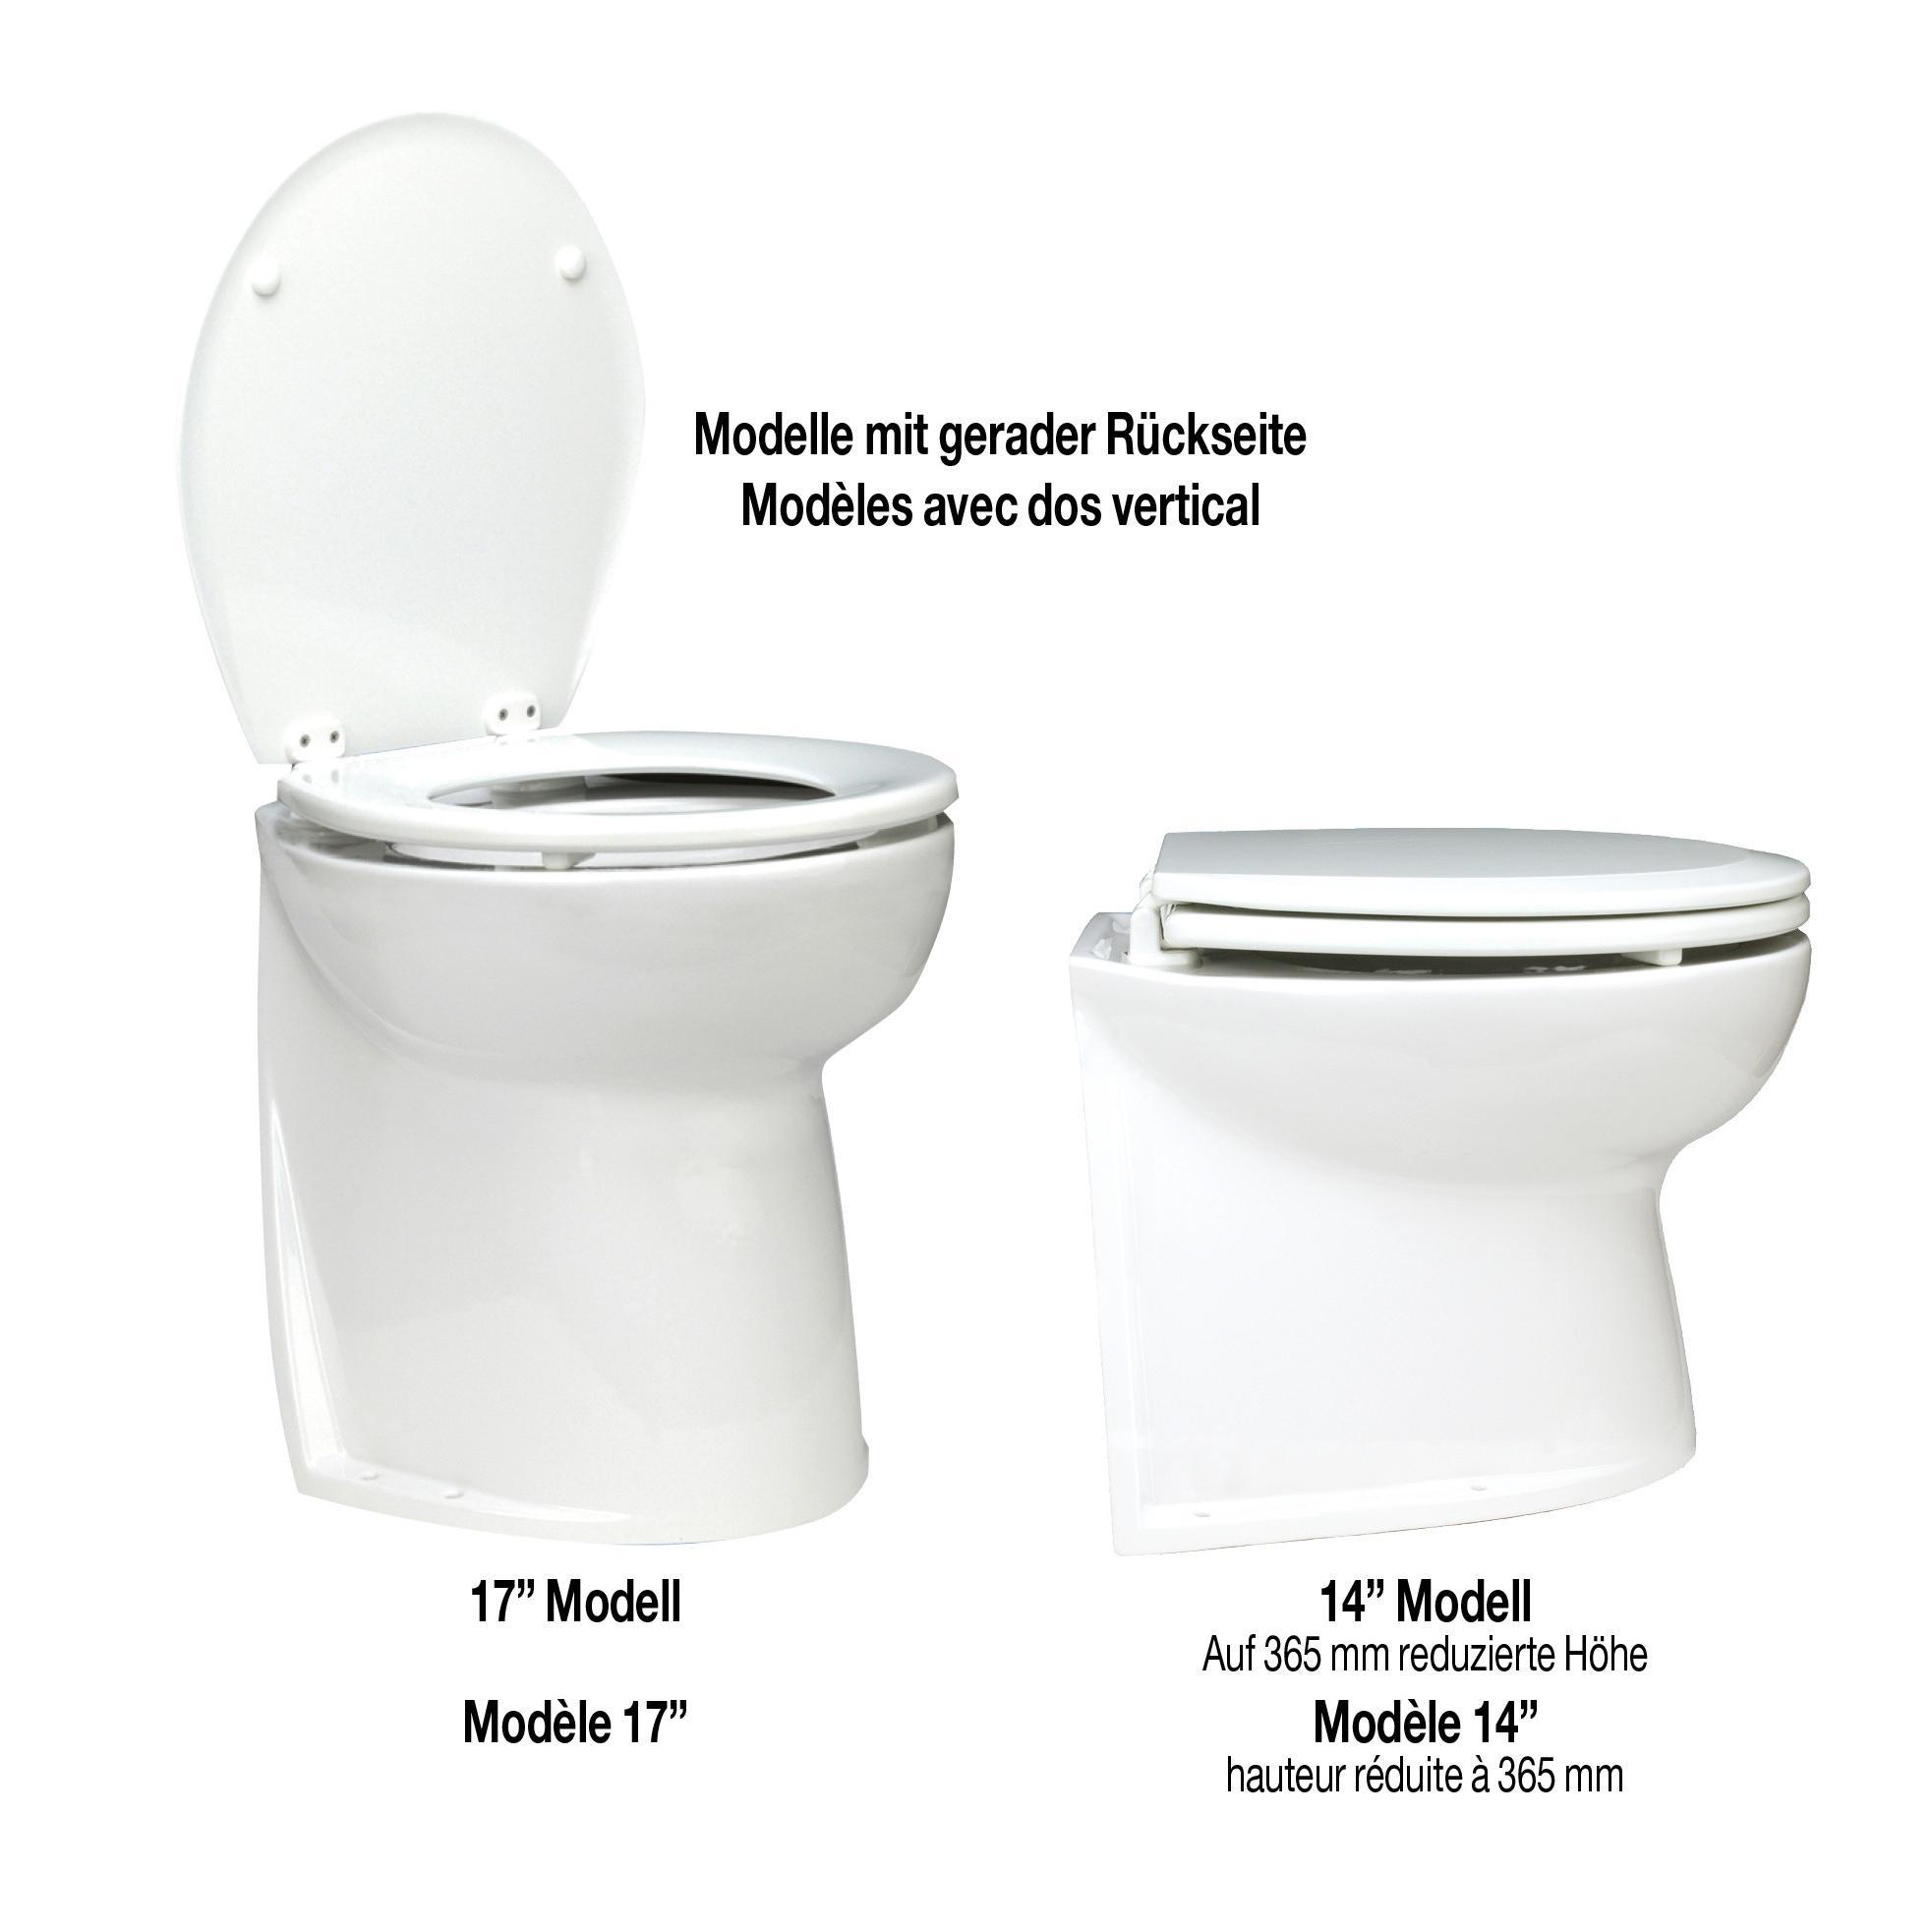 Geräuscharme elektrische Deluxe Flush Toiletten, Modelle mit senkrechter  Rückseite